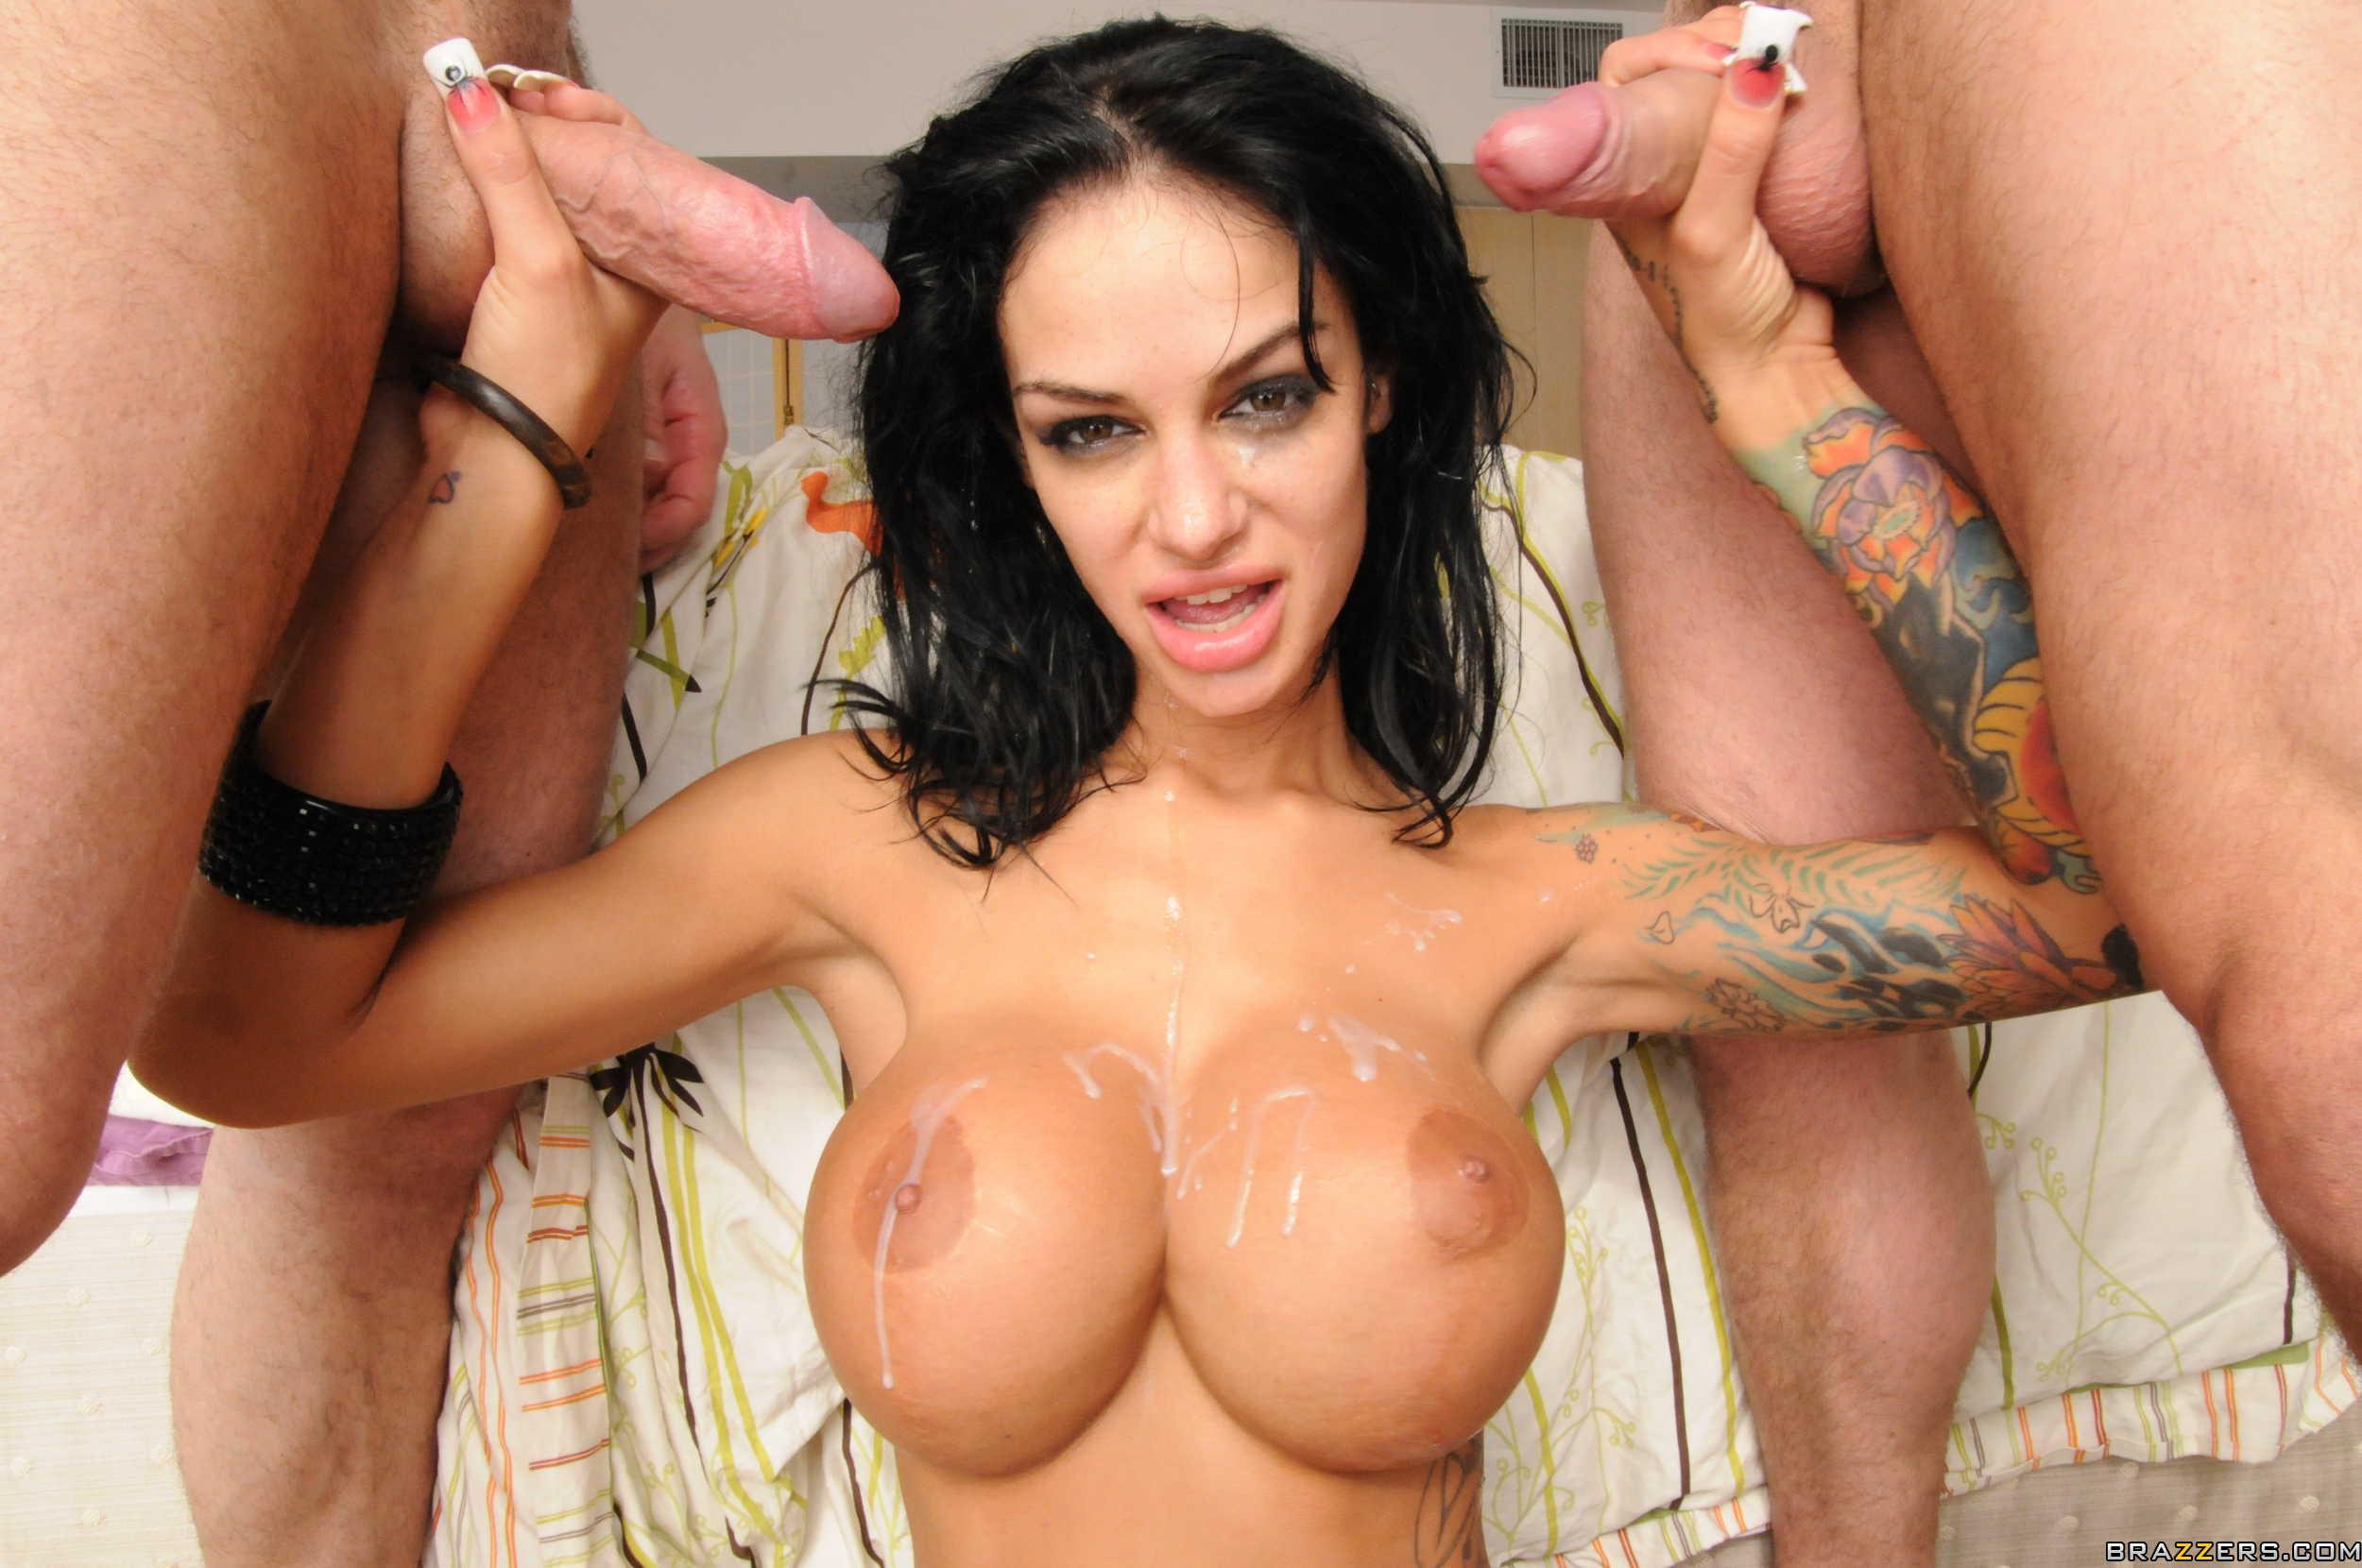 angelina valentine fisting - Latina bbw blogspot. Buttman fetish videos